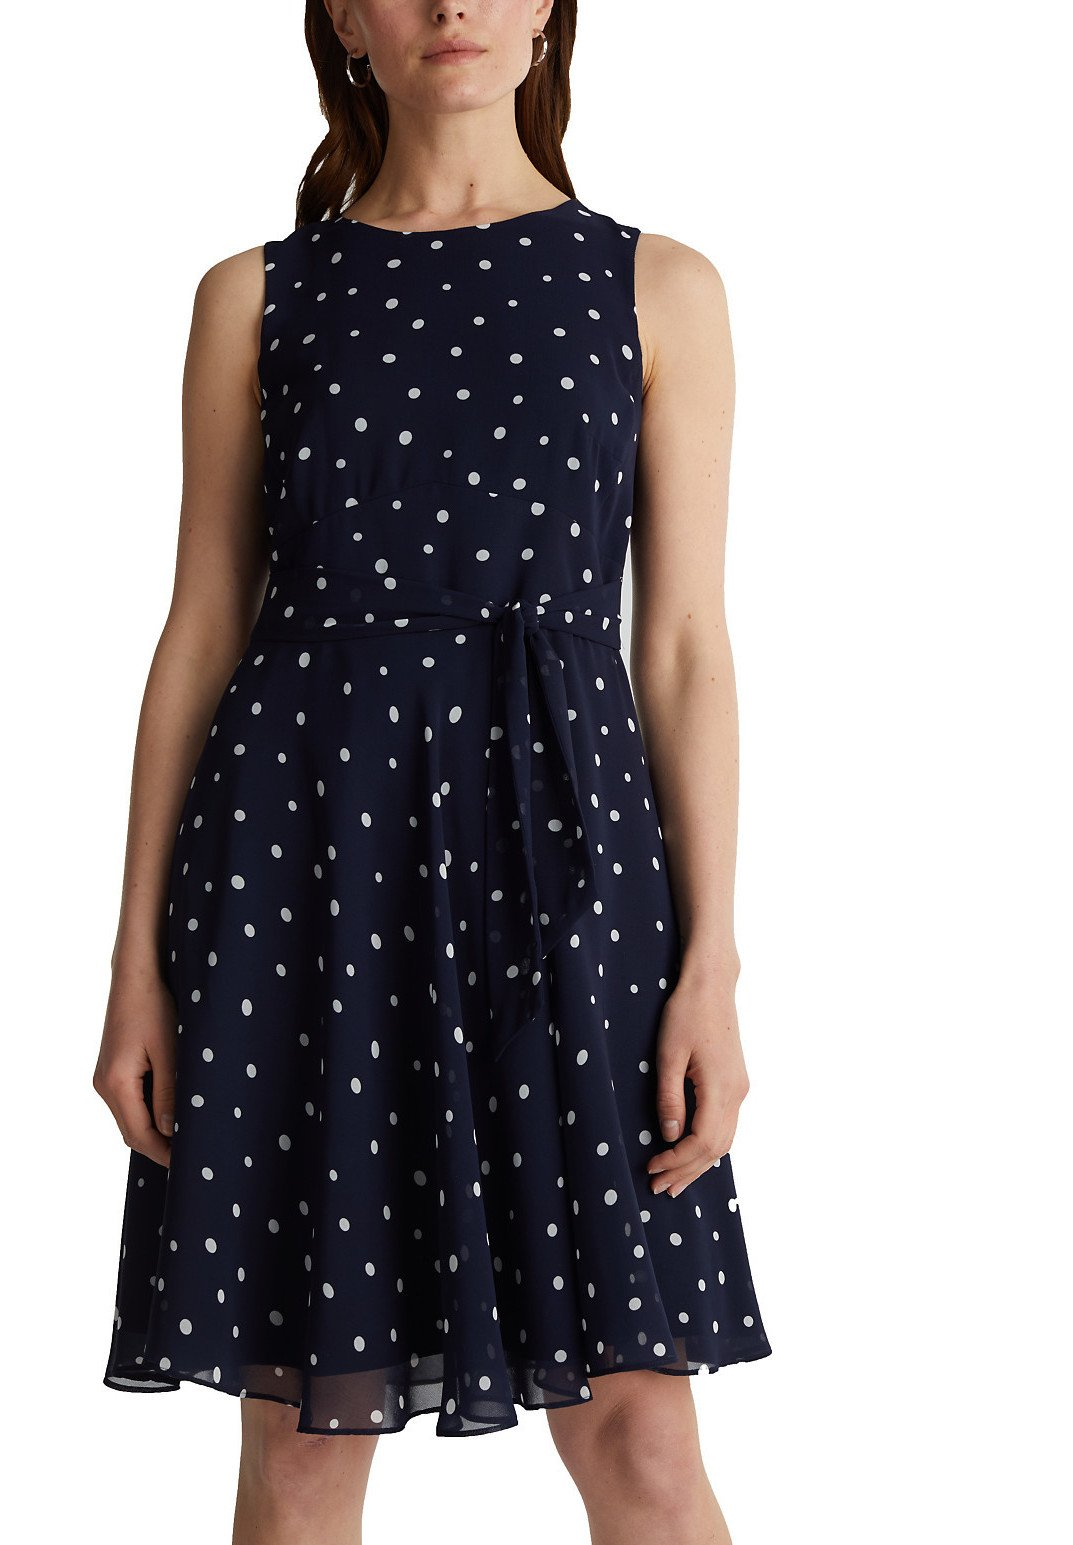 Order Limit Discount Women's Clothing Esprit Collection LUX FLUID Day dress navy 3 bIH4cCVKT wyEMu7HlW